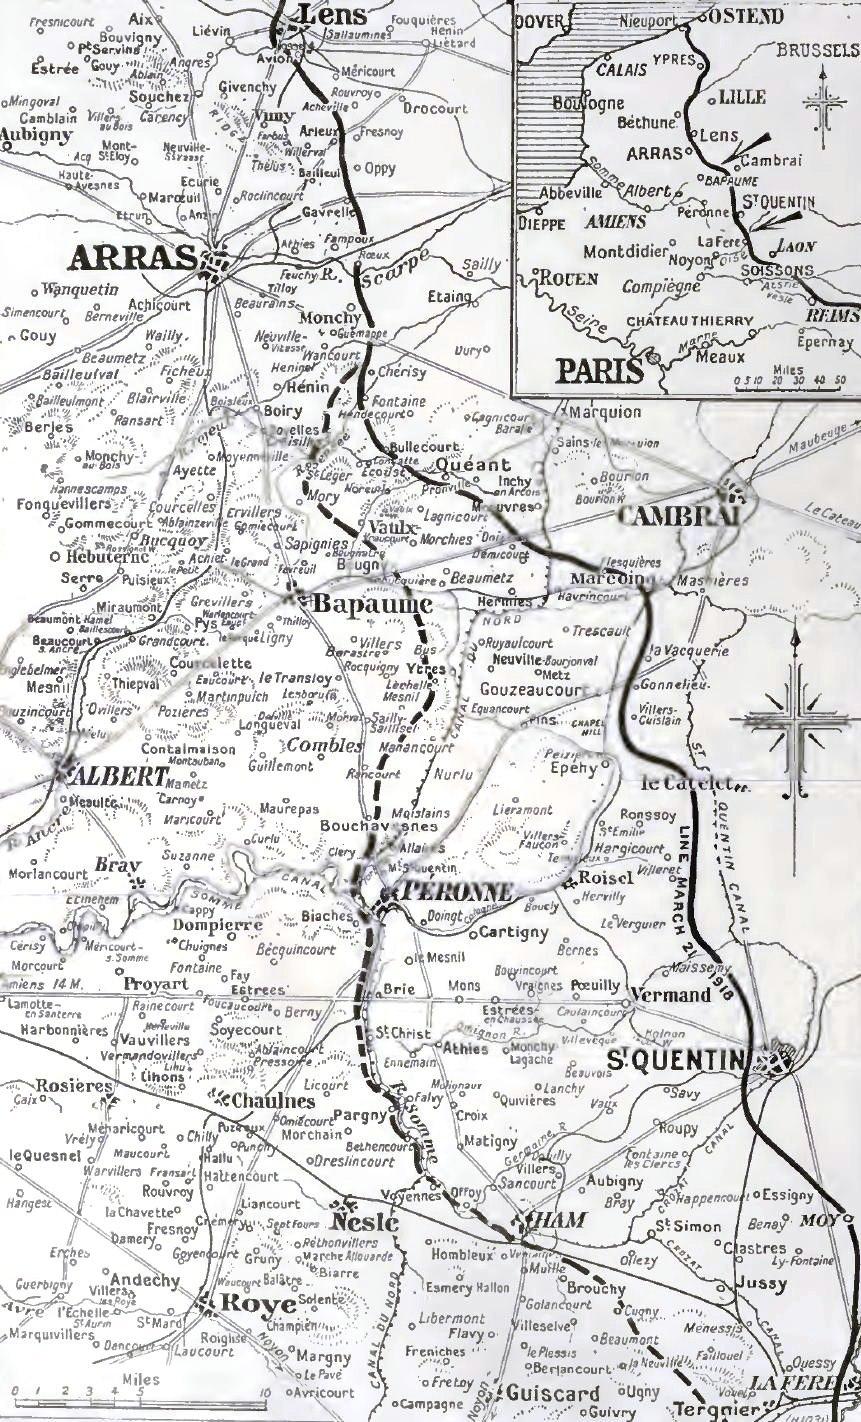 German advance, 21-23 March 1918